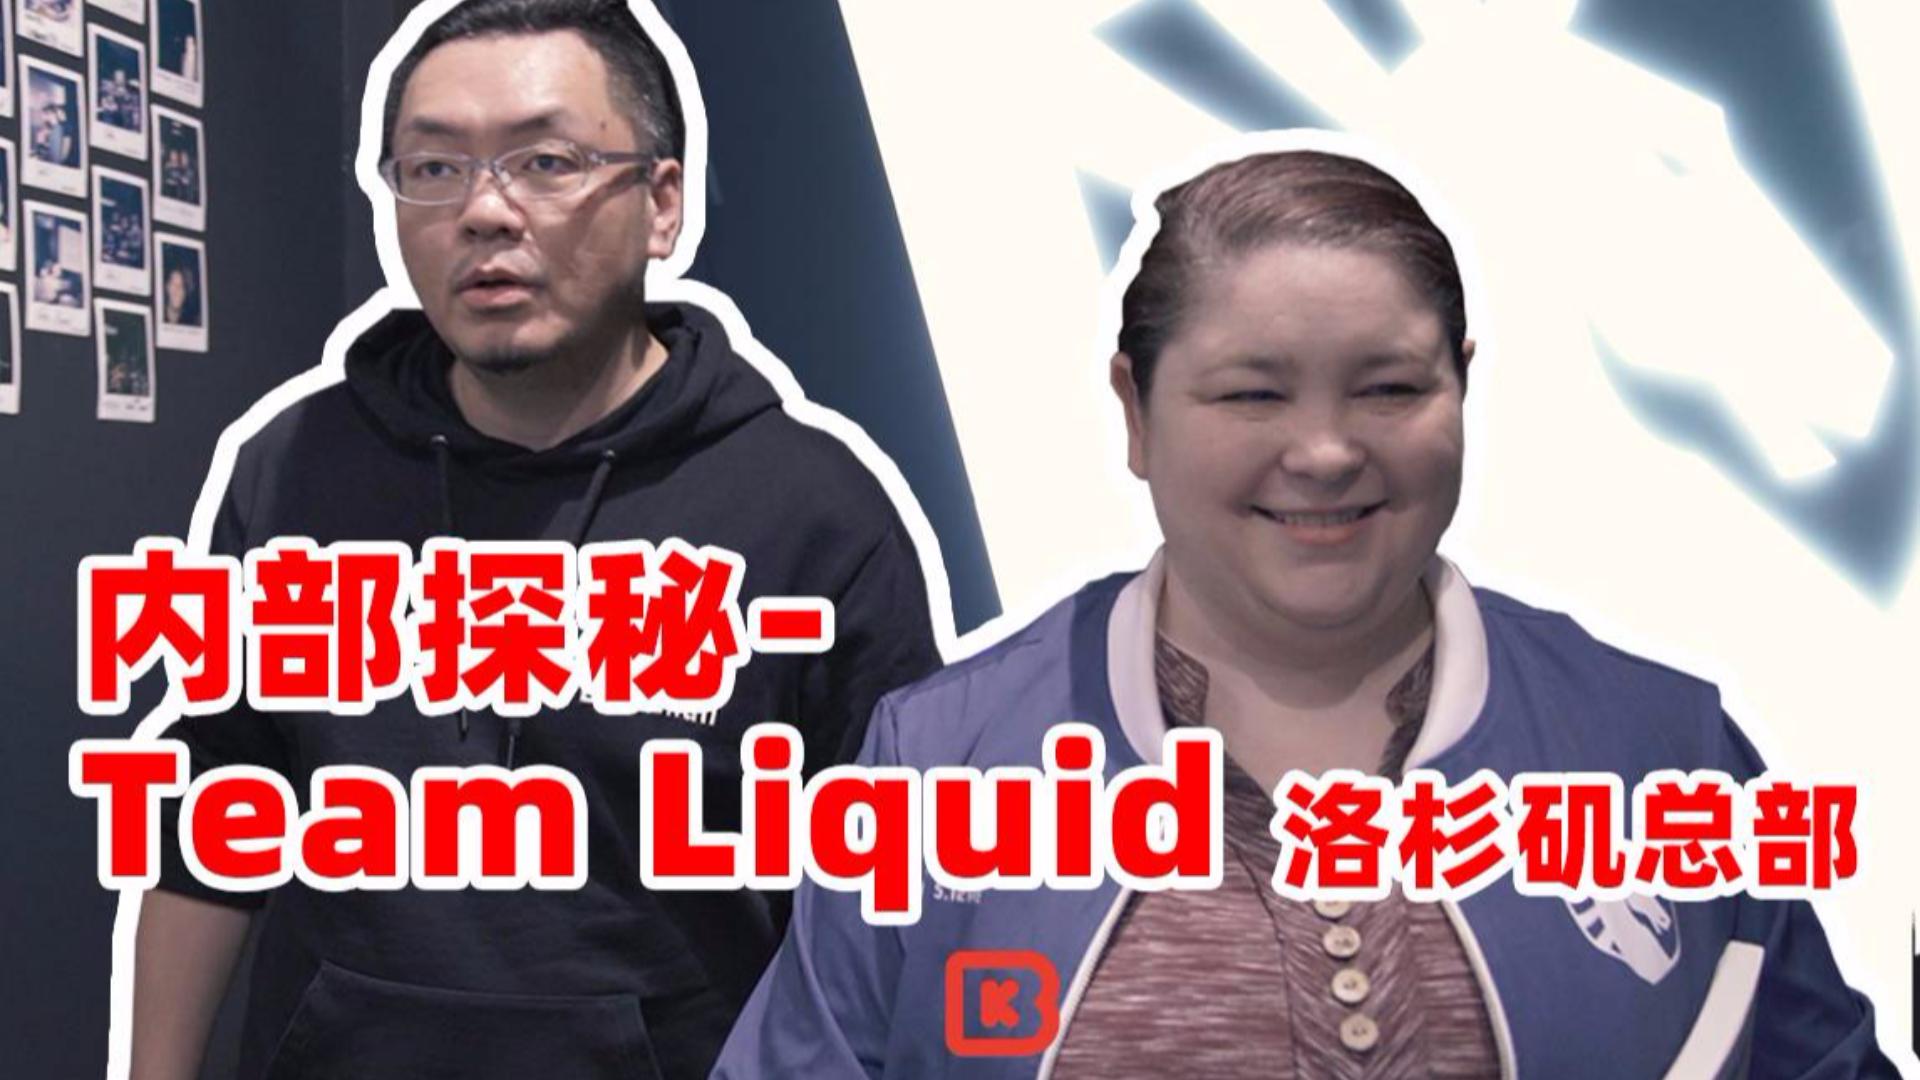 TeamLiquid美国总部探访 美国电竞发展如何?丨BK短纪录片